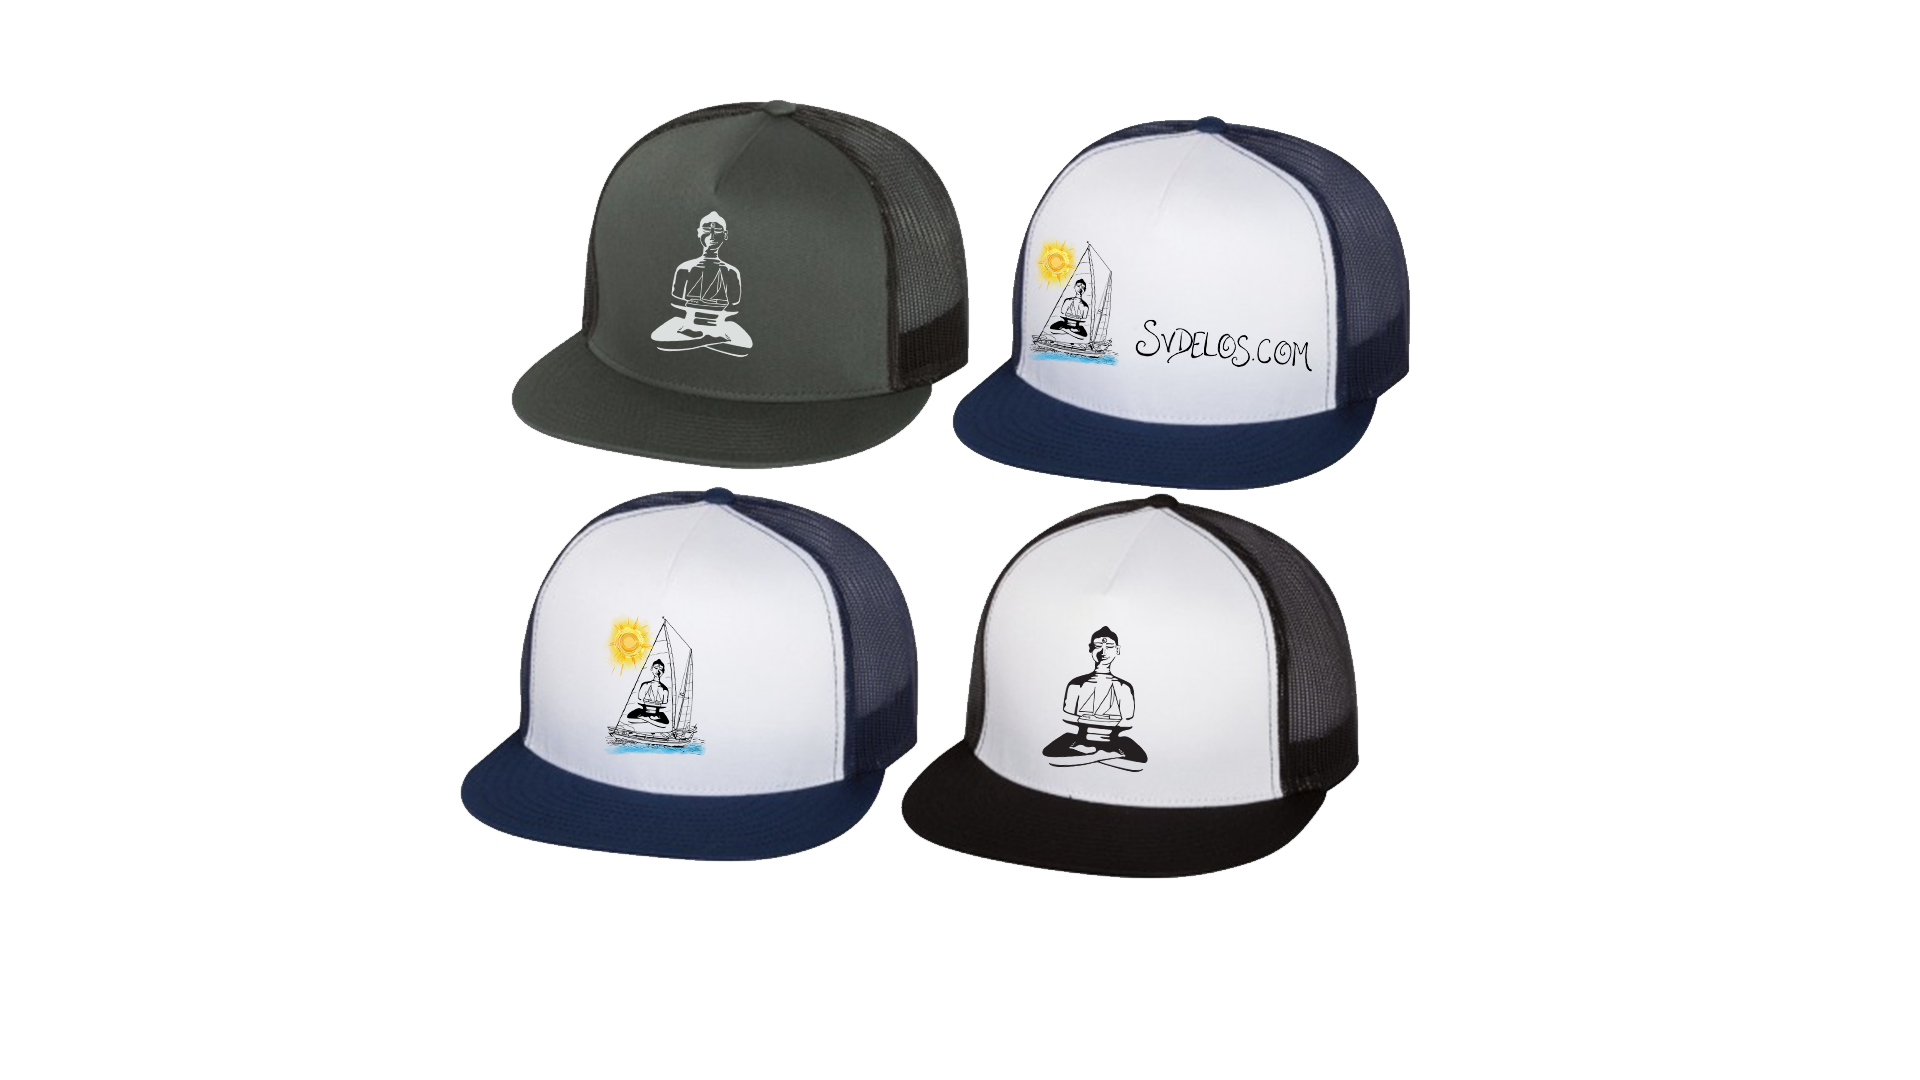 Delos Adjustable Trucker Hats!